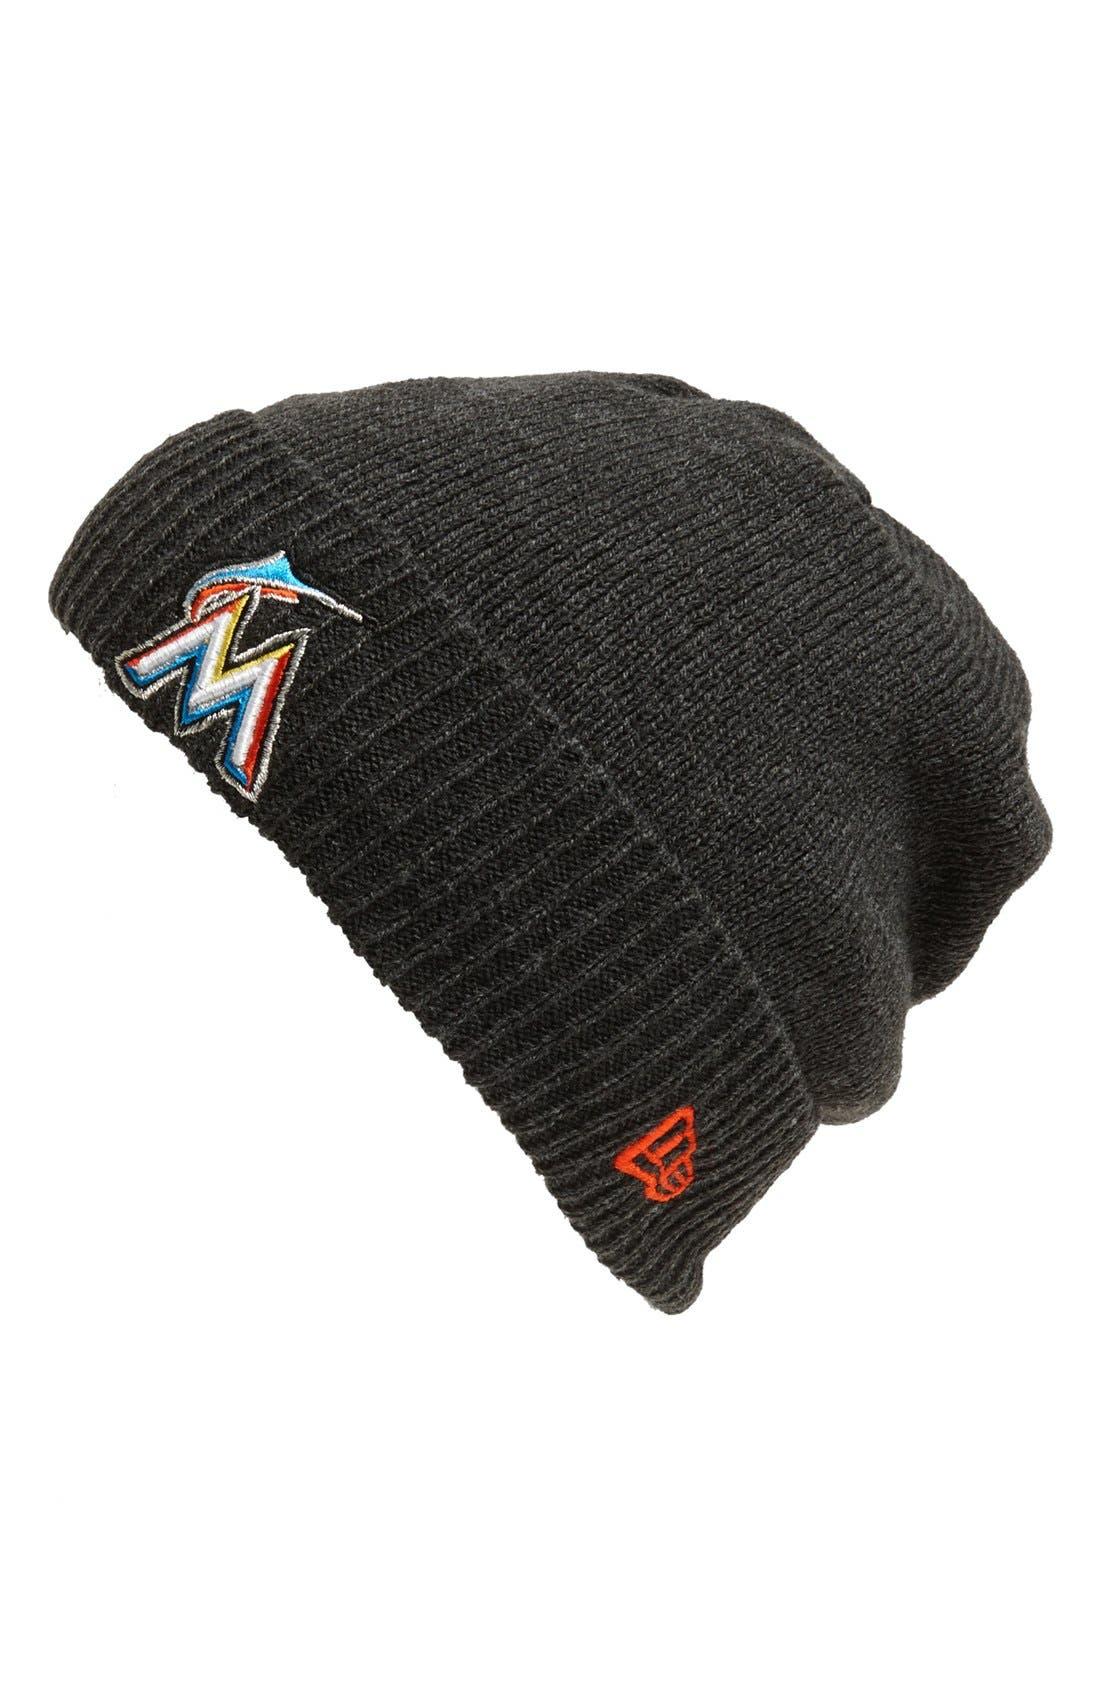 Main Image - New Era Cap 'Miami Marlins - Thermal Cuff' Beanie